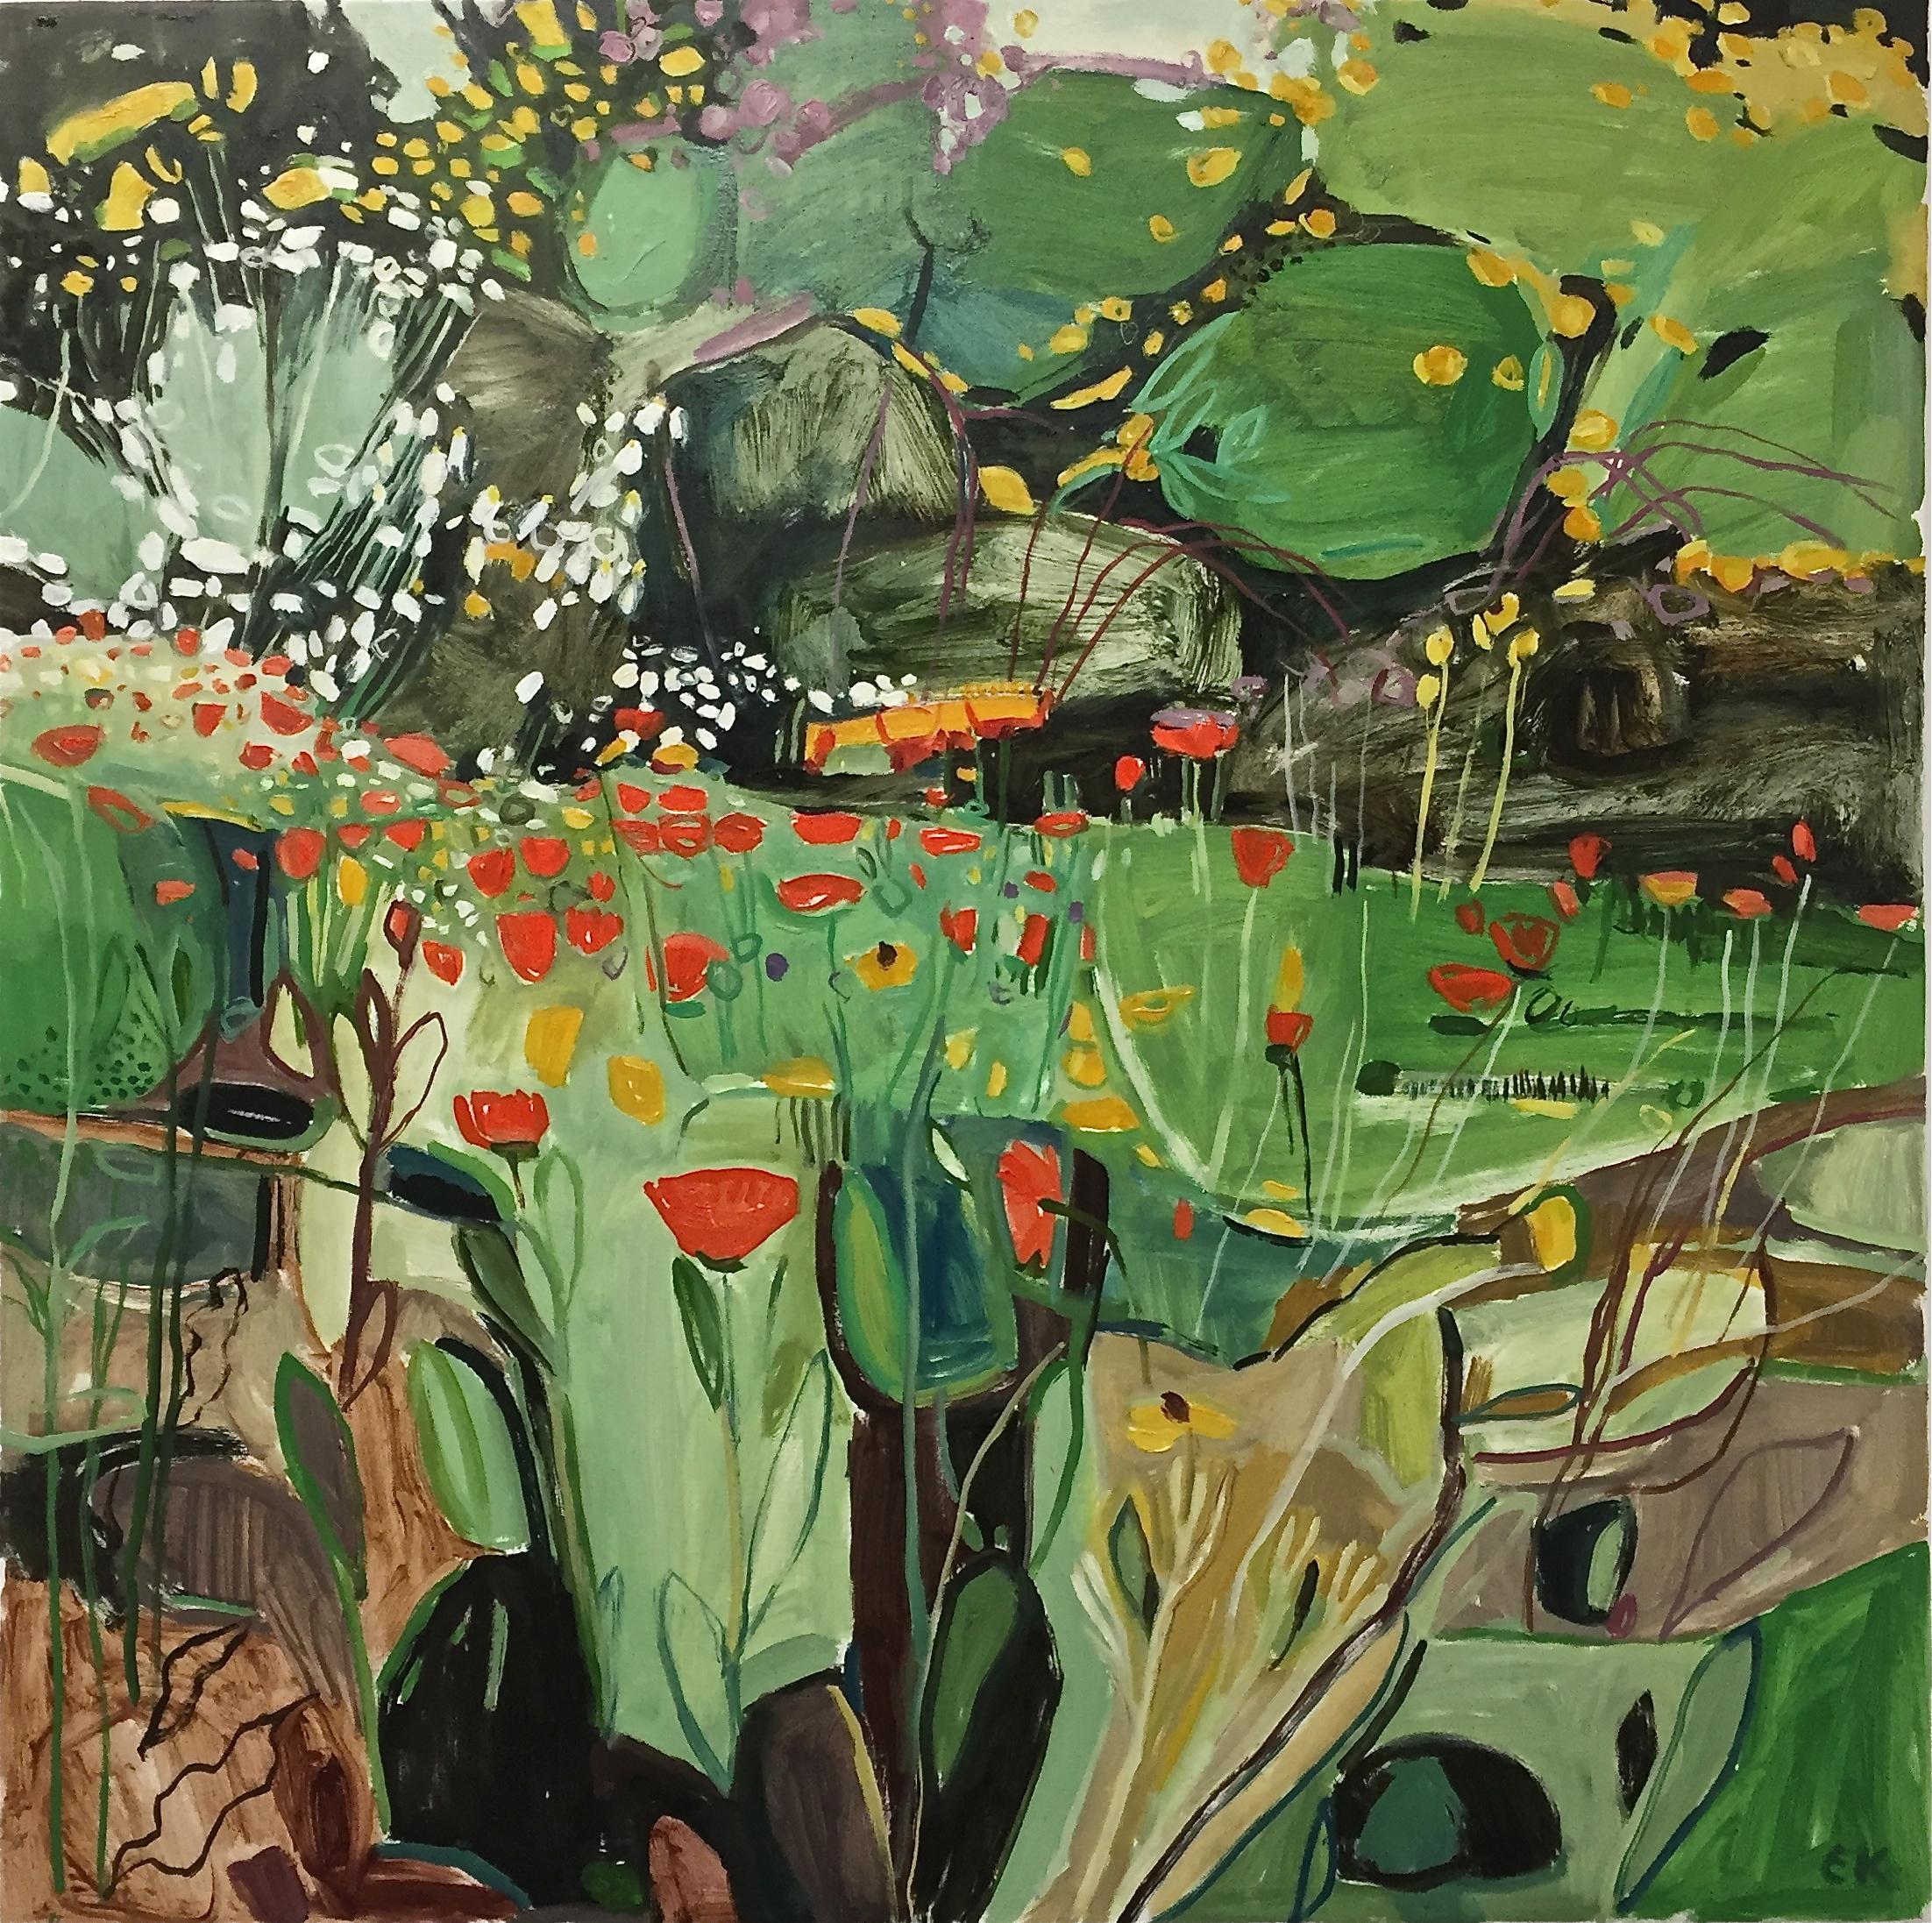 More Marigolds! Oxford Botanic Gardens